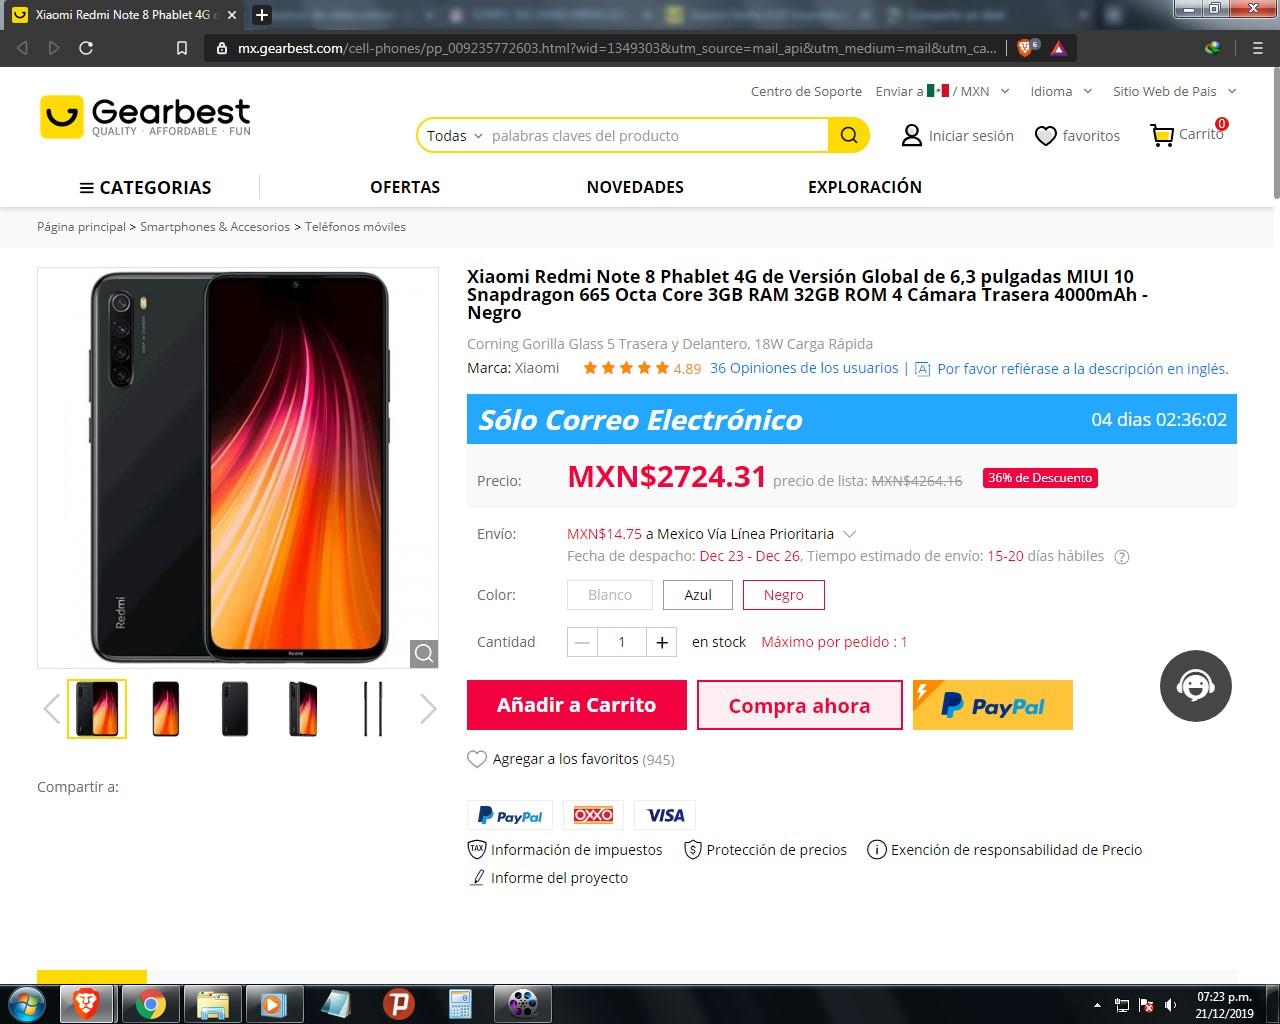 Gearbest: Xiaomi Redmi Note 8